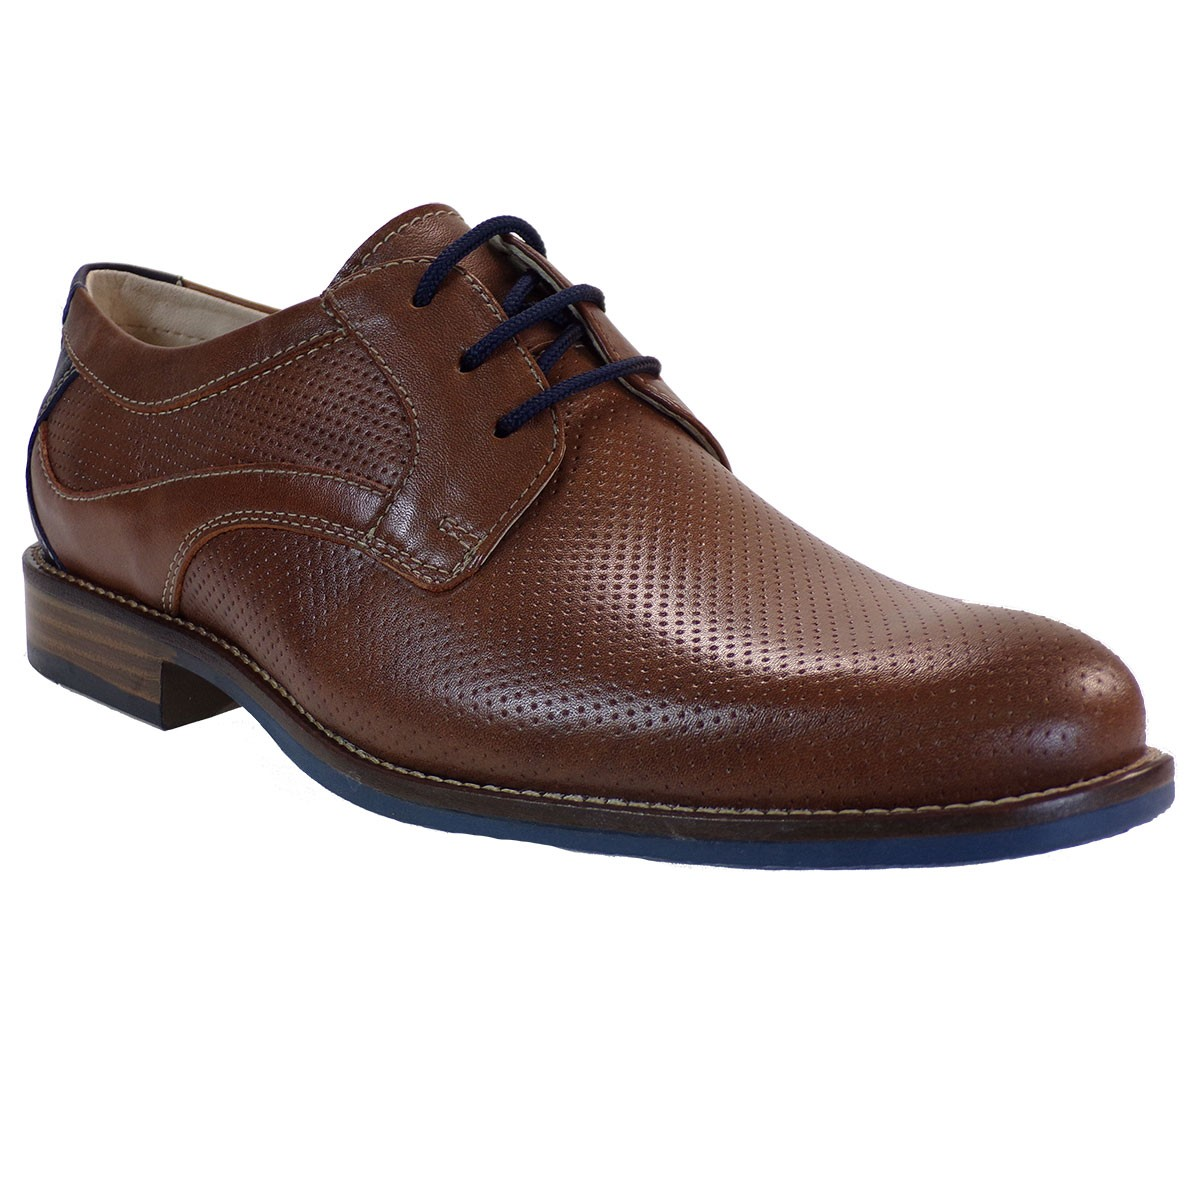 Softies Ανδρικά Παπούτσια 6998 Ταμπά Δέρμα